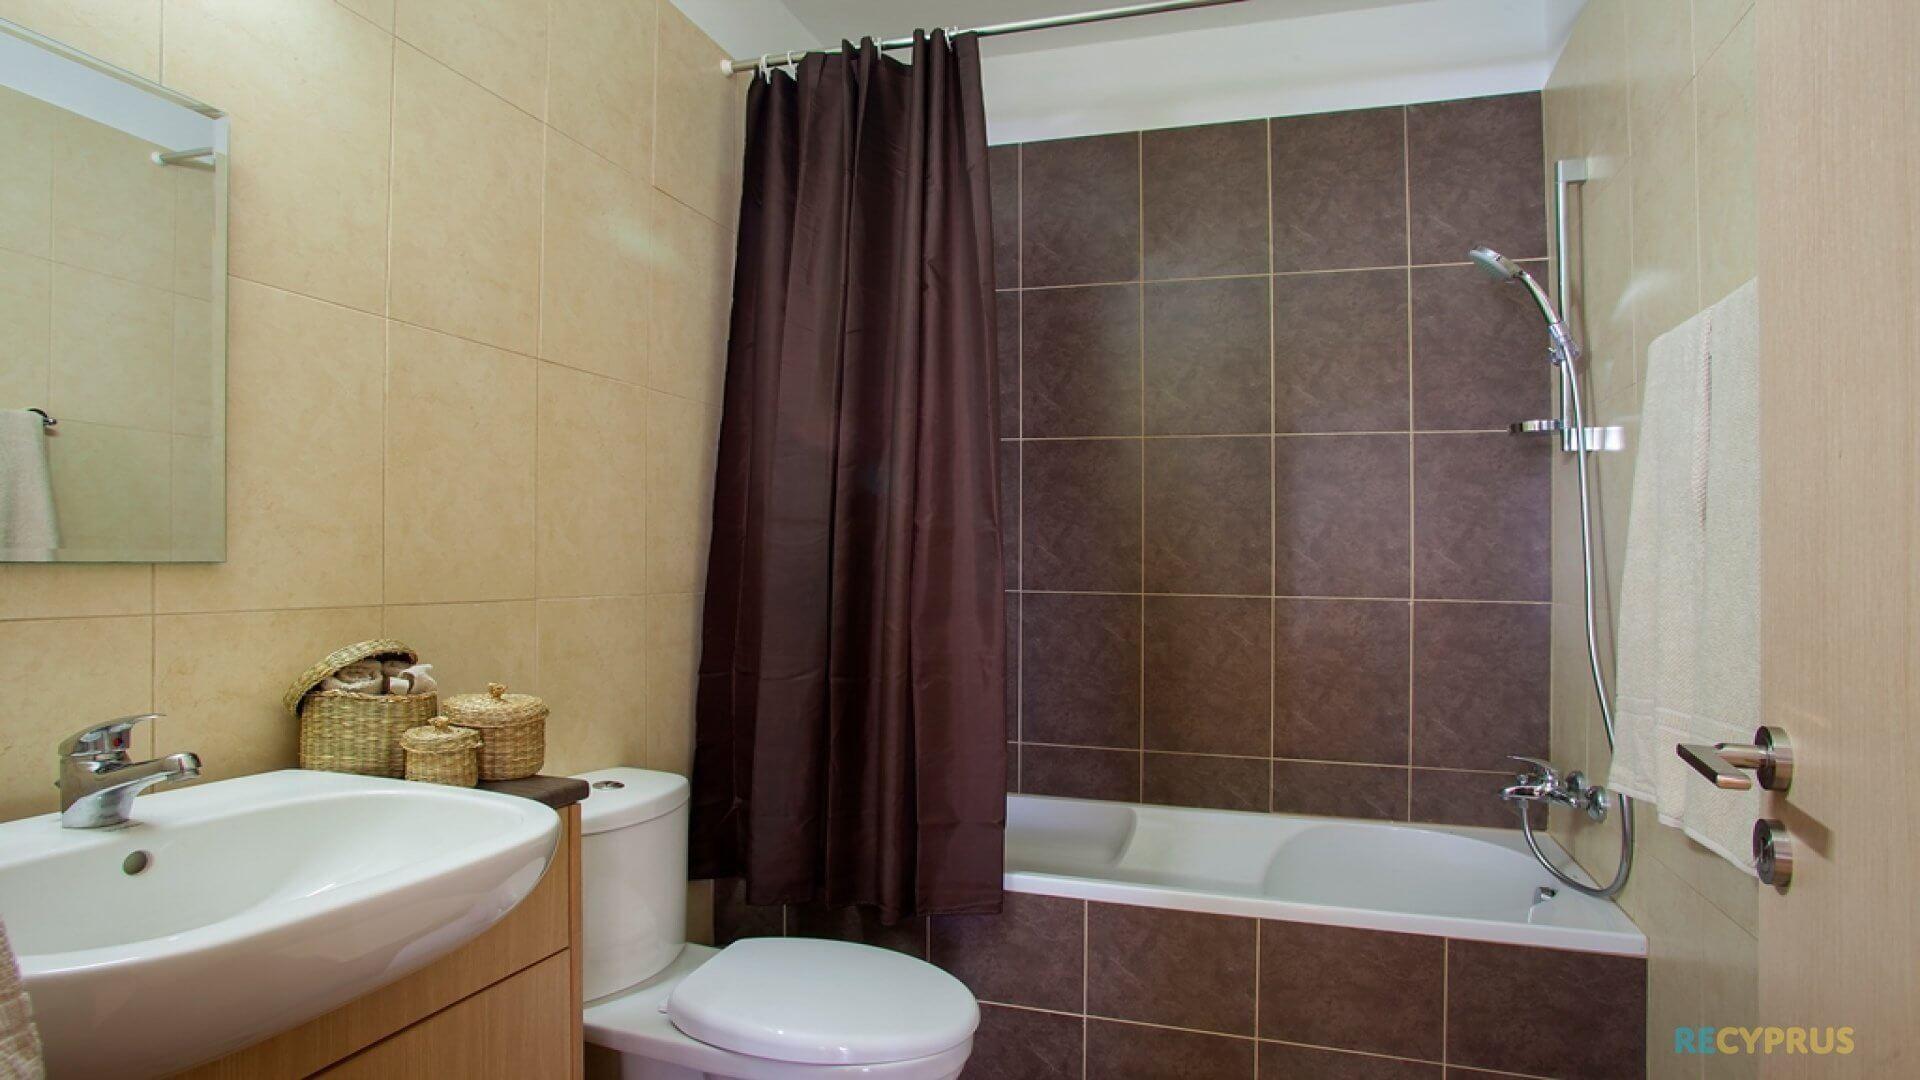 Apartment for sale Kapparis Famagusta Cyprus 7 3442